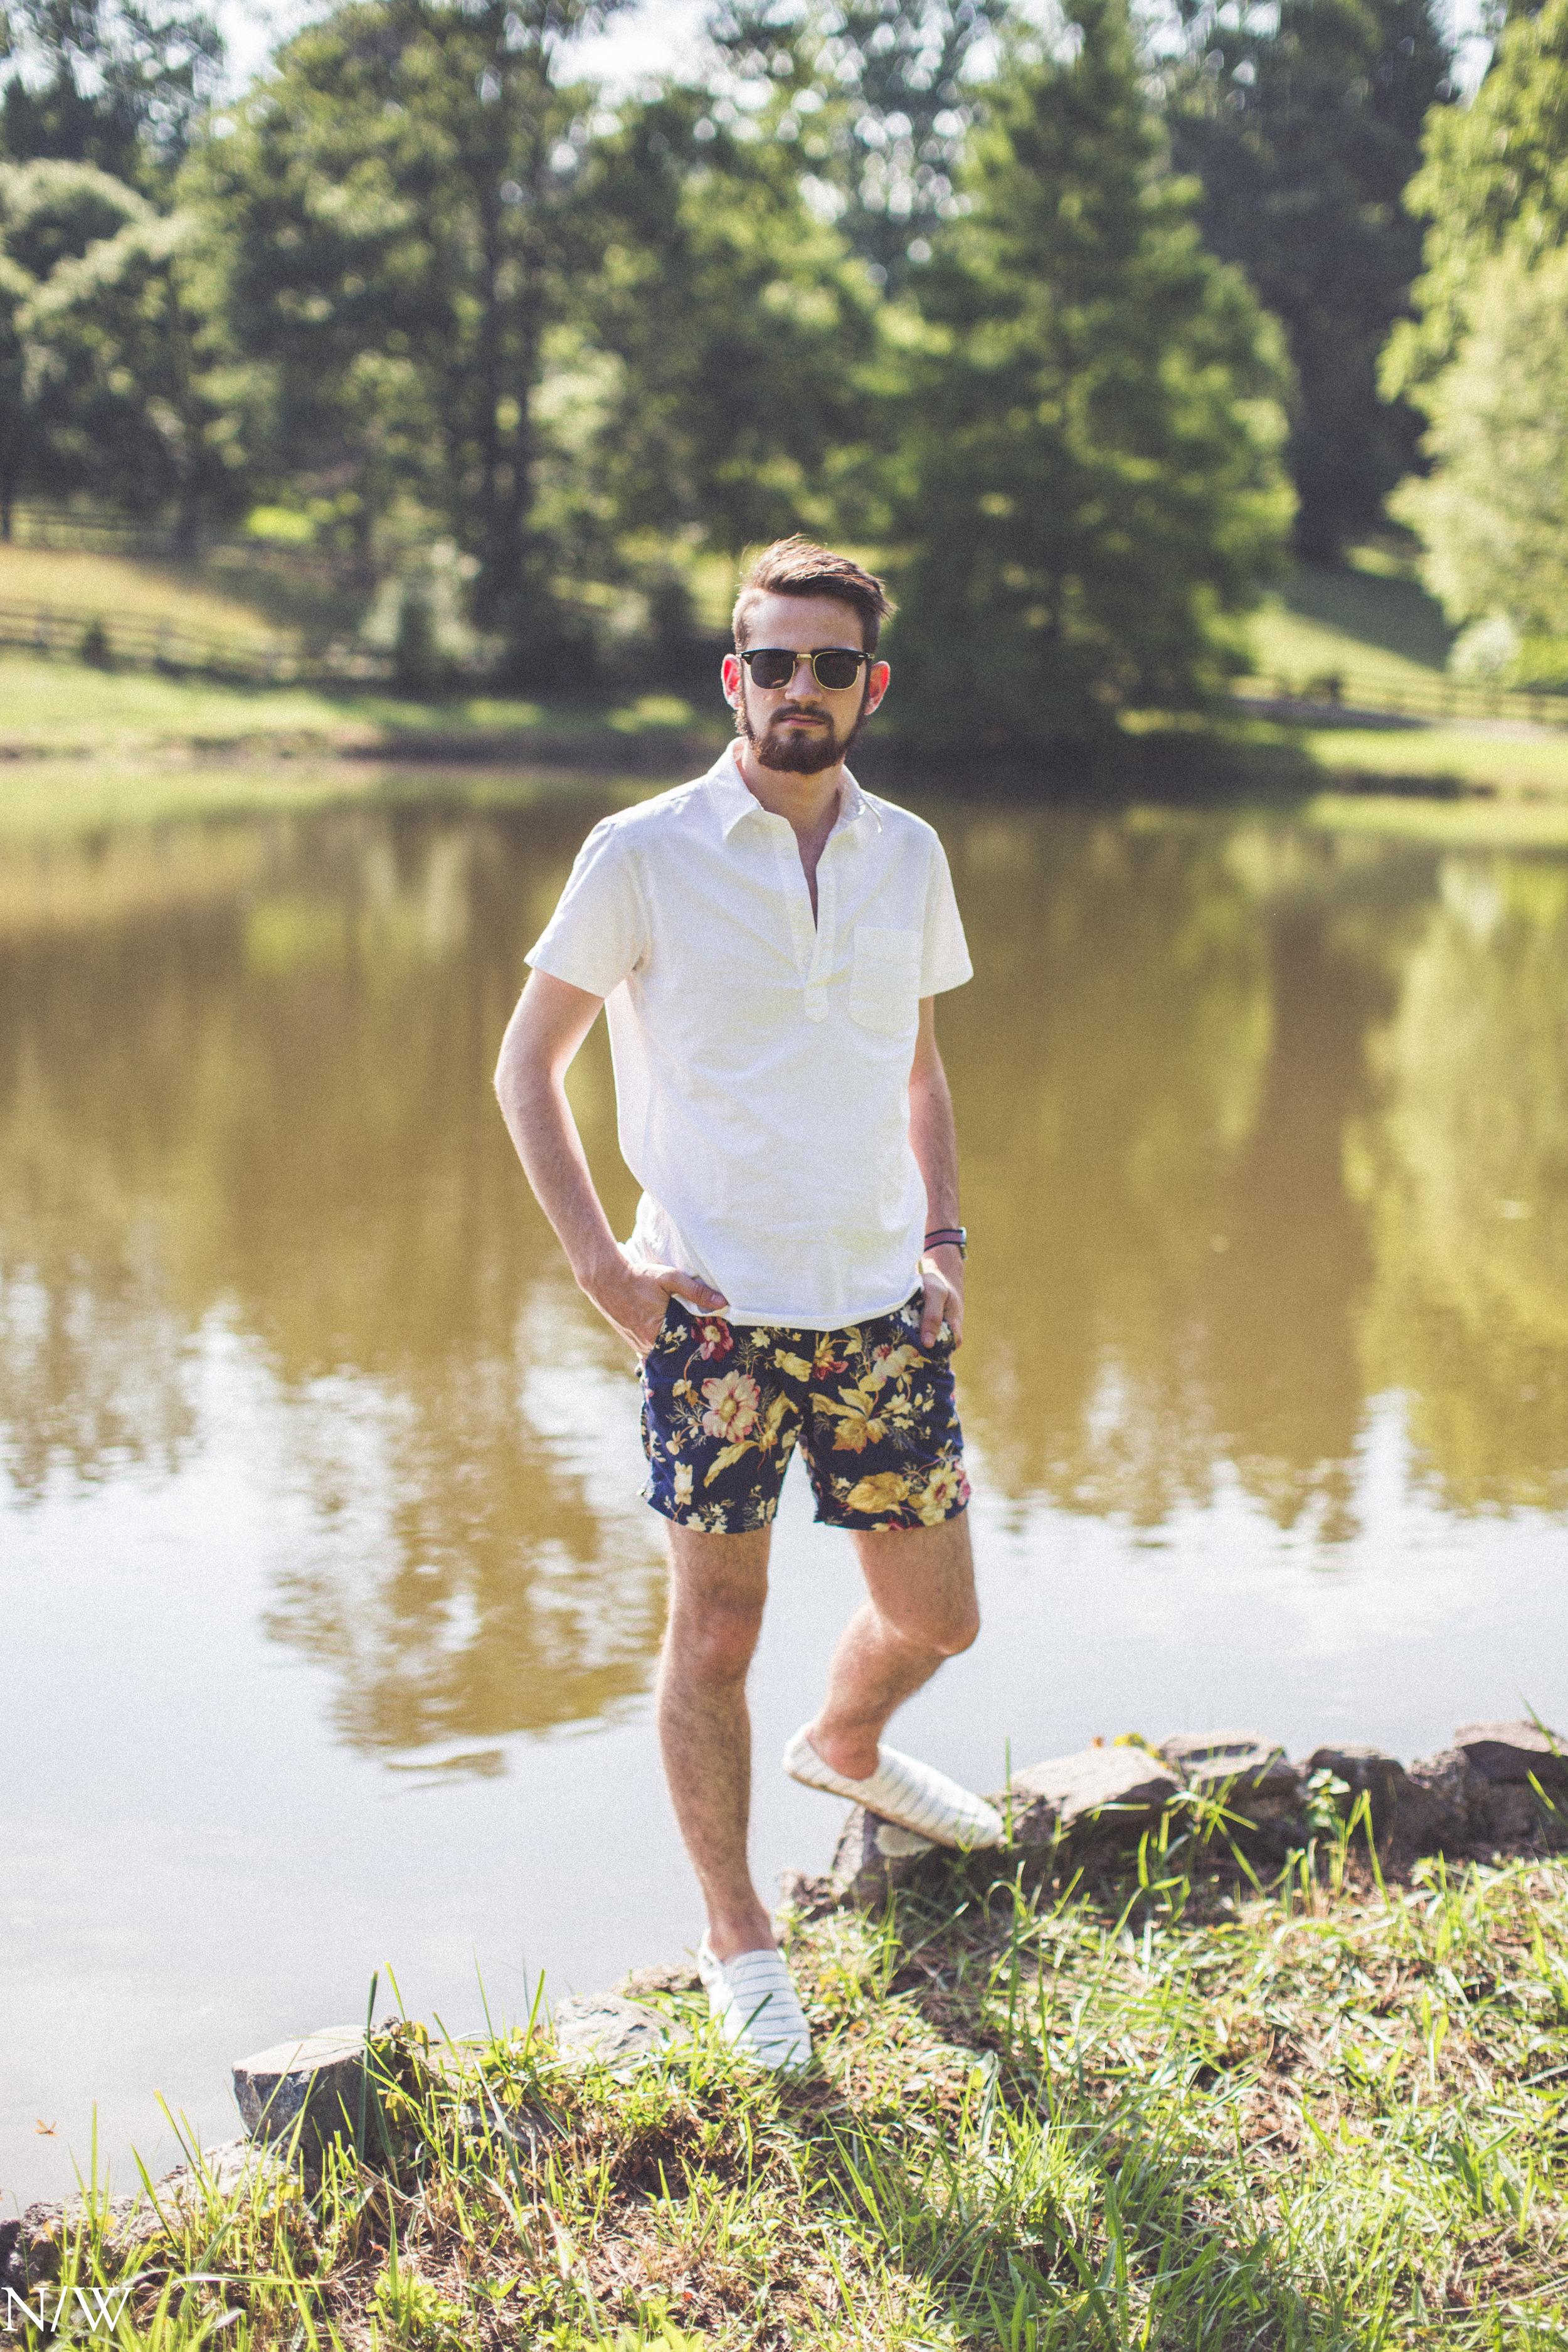 Shoes, Shirt, Swim Trunks: Jcrew